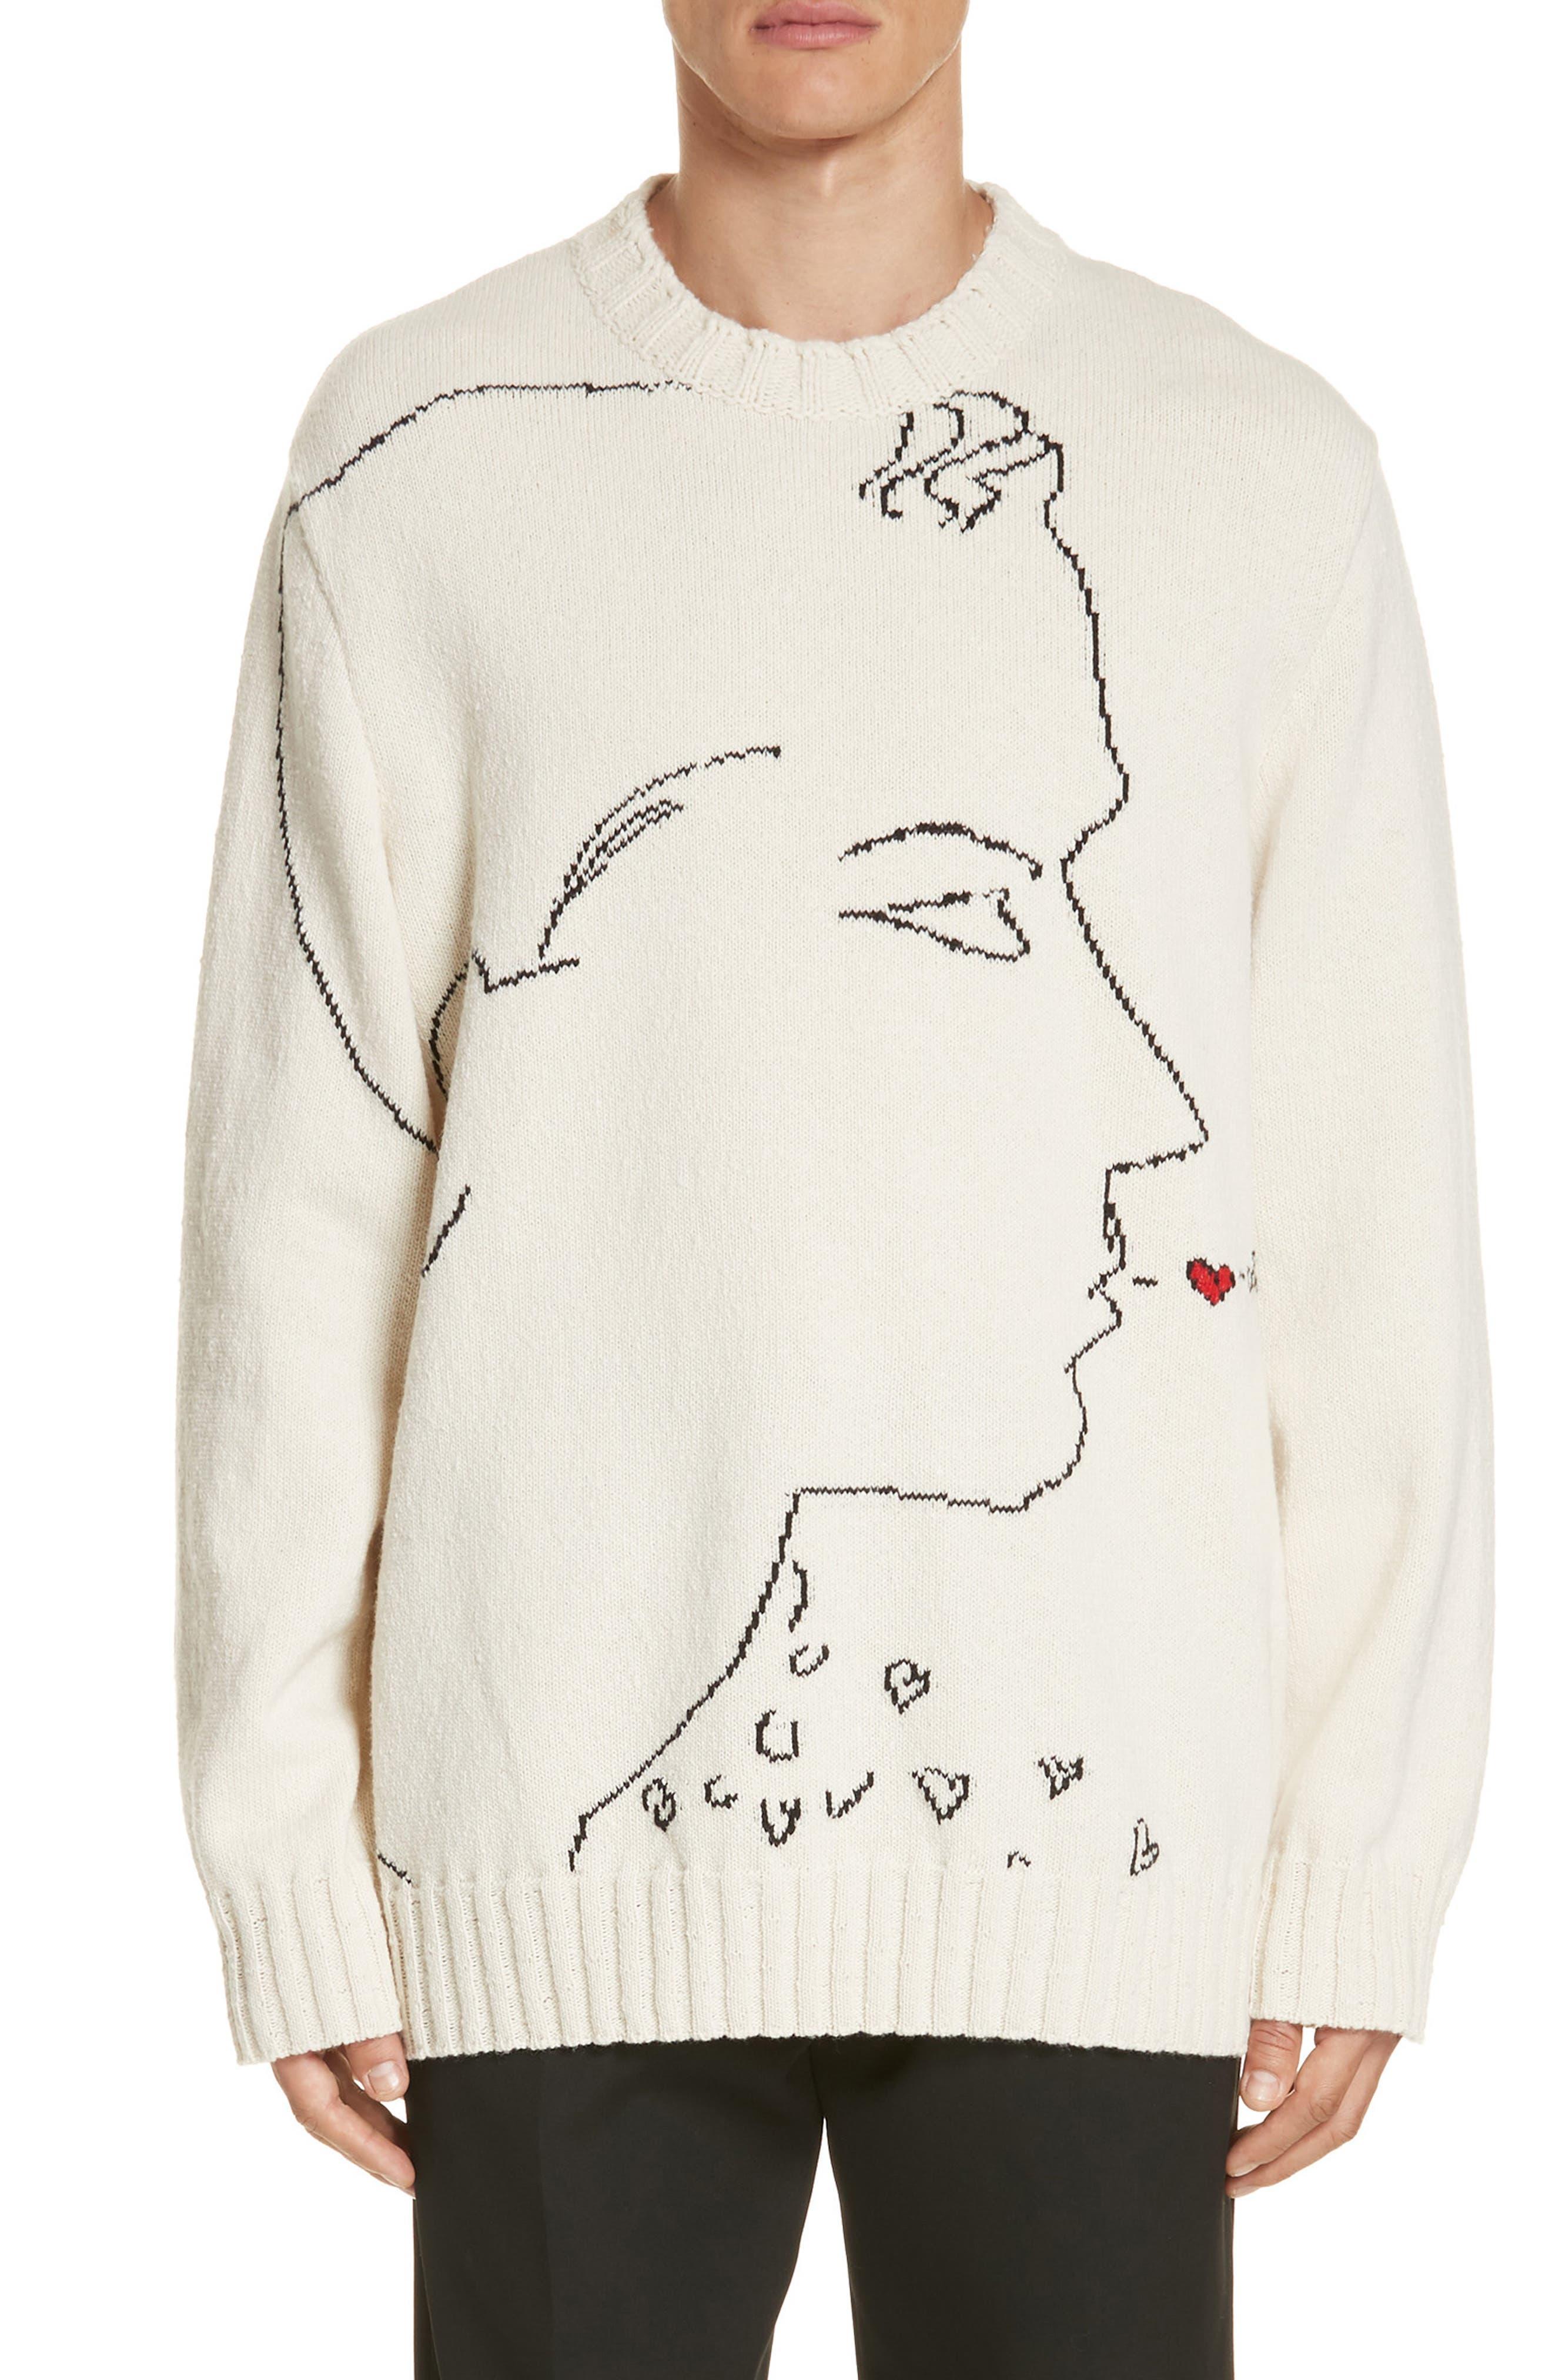 CALVIN KLEIN 205W39NYC,                             Print Wool Sweater,                             Main thumbnail 1, color,                             ECRU BLACK RED